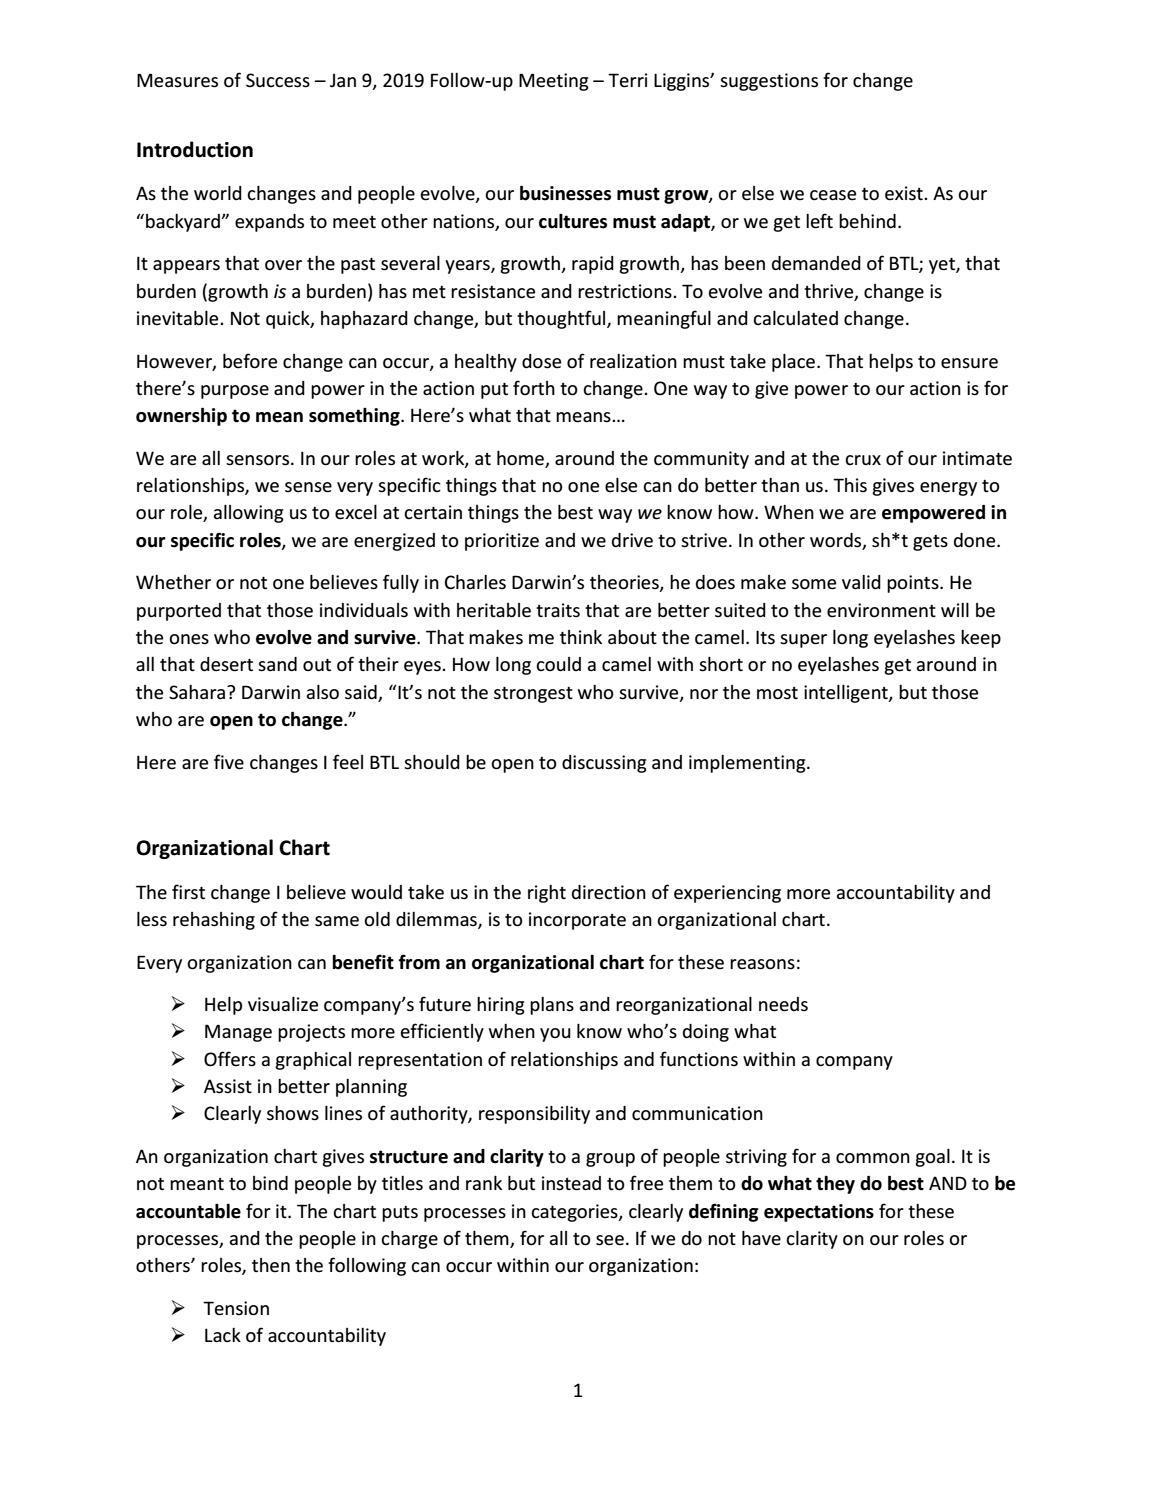 Terri Liggins' suggested MOS for BTL in 2019 by